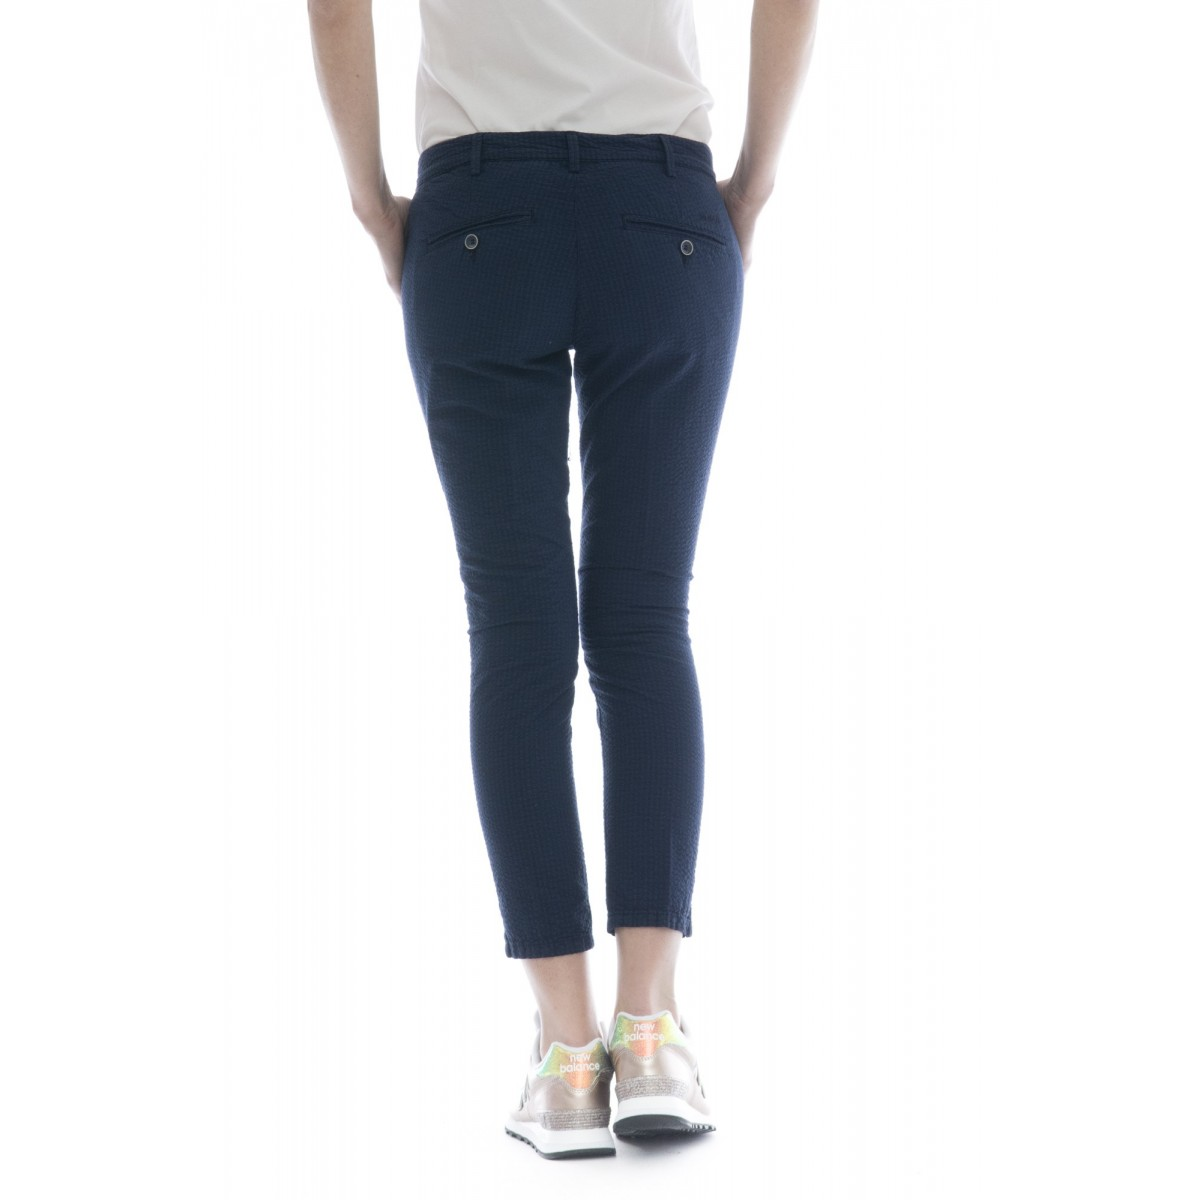 Pantalone donna - Melitas 1202 micro vichy